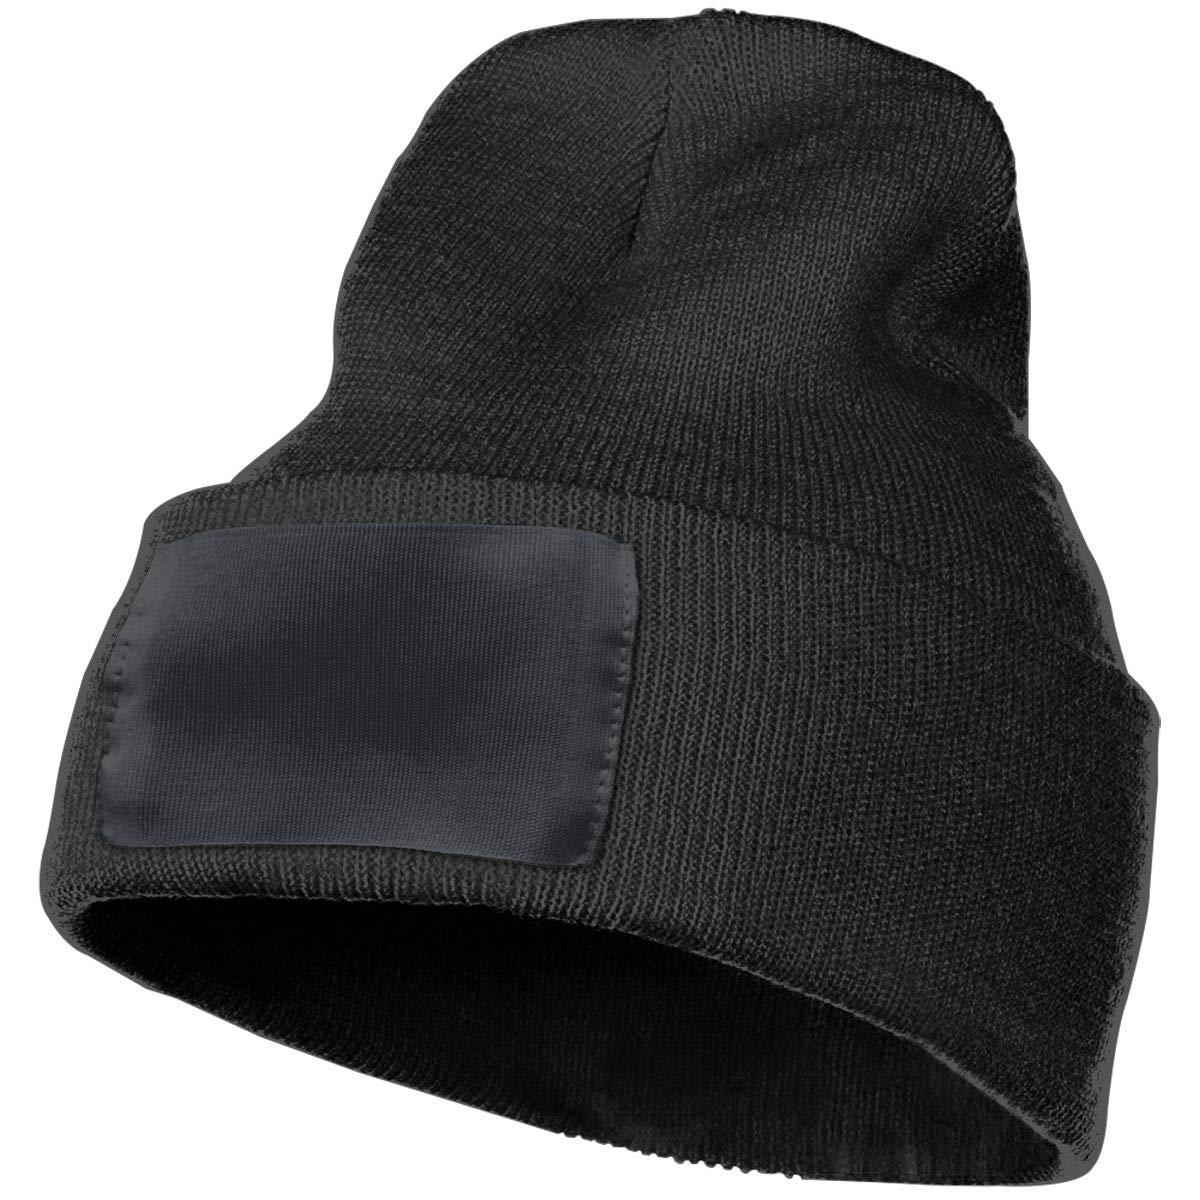 100/% Acrylic Acid Mas Beanie Hat Ruin Fashion Knitting Hat for Men Women